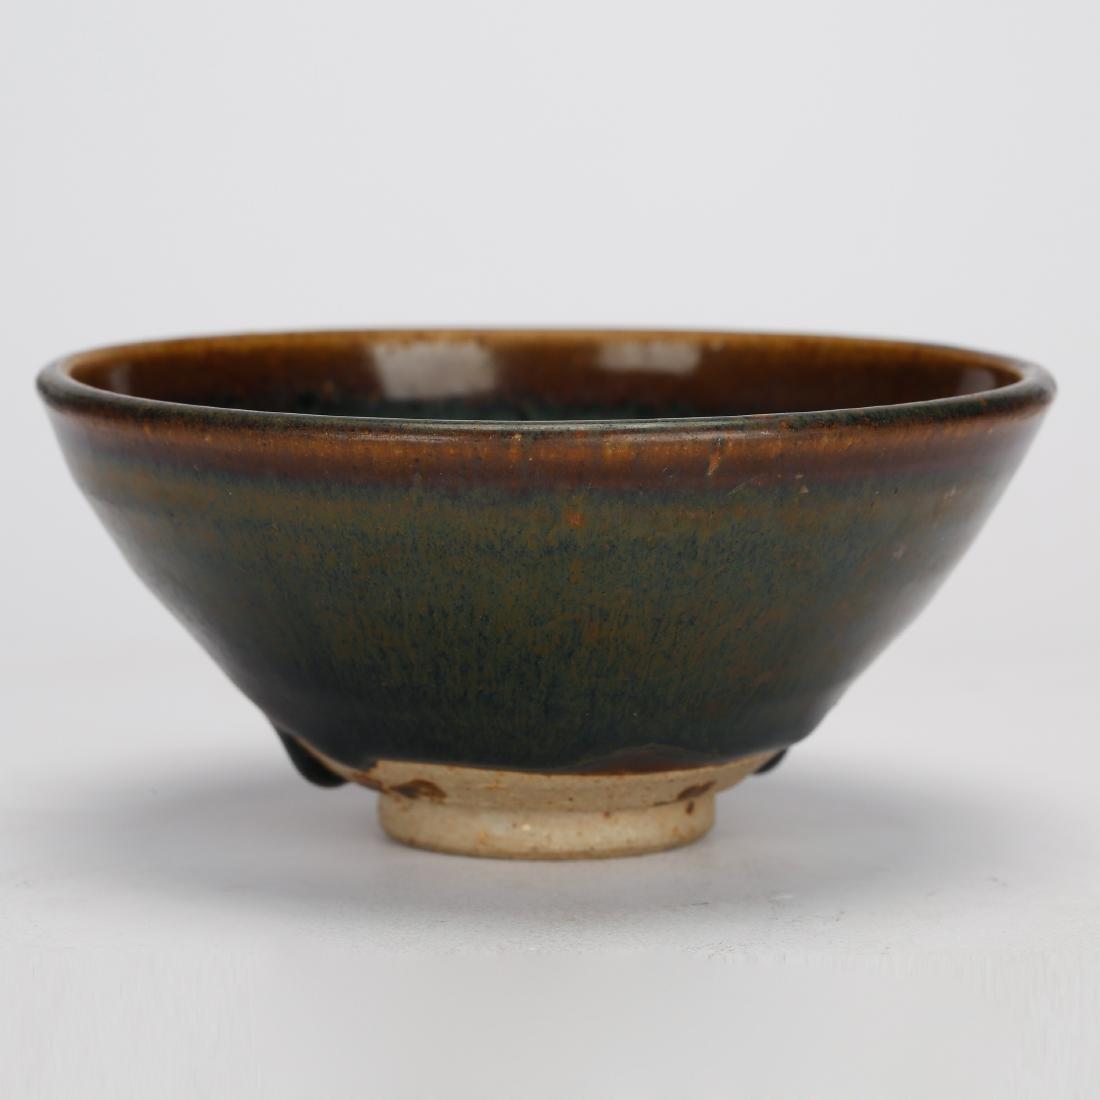 CHINESE JIAN WARE TEA BOWL, QING DYNASTY